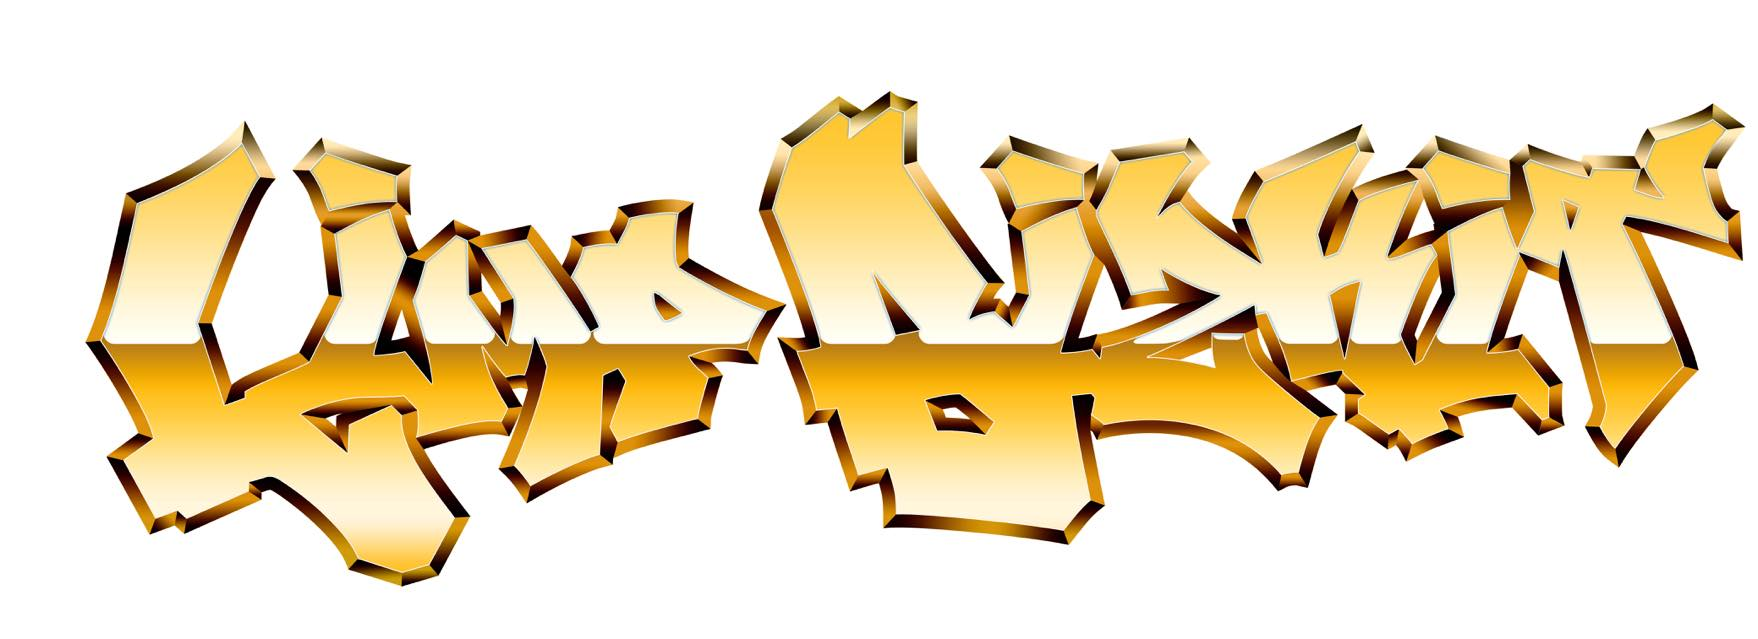 limp bizkit uusi logonsa black metal tyyliseksi � kaaoszine